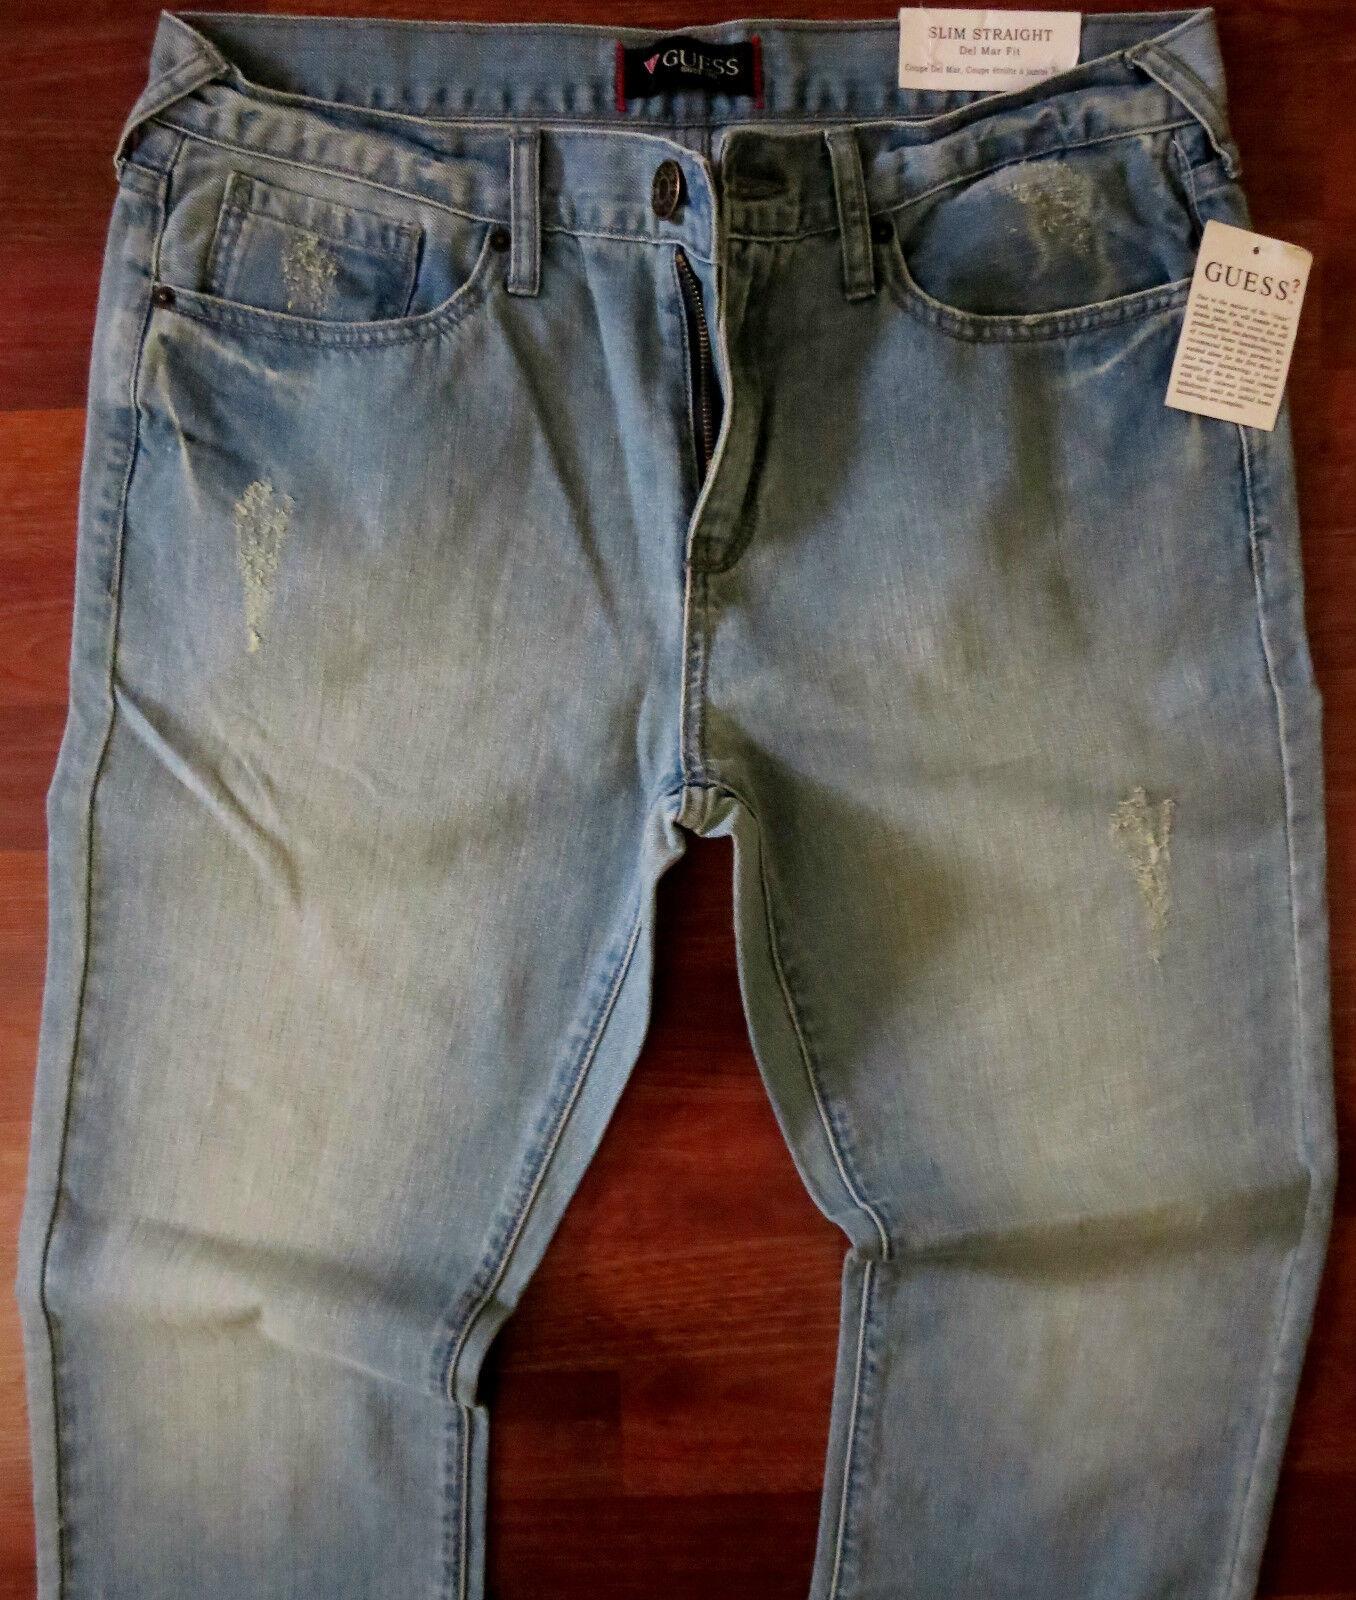 989cfc01 Guess Slim Straight Leg Jeans Men Size 29 X 30 Vintage Distressed Light  Wash NEW